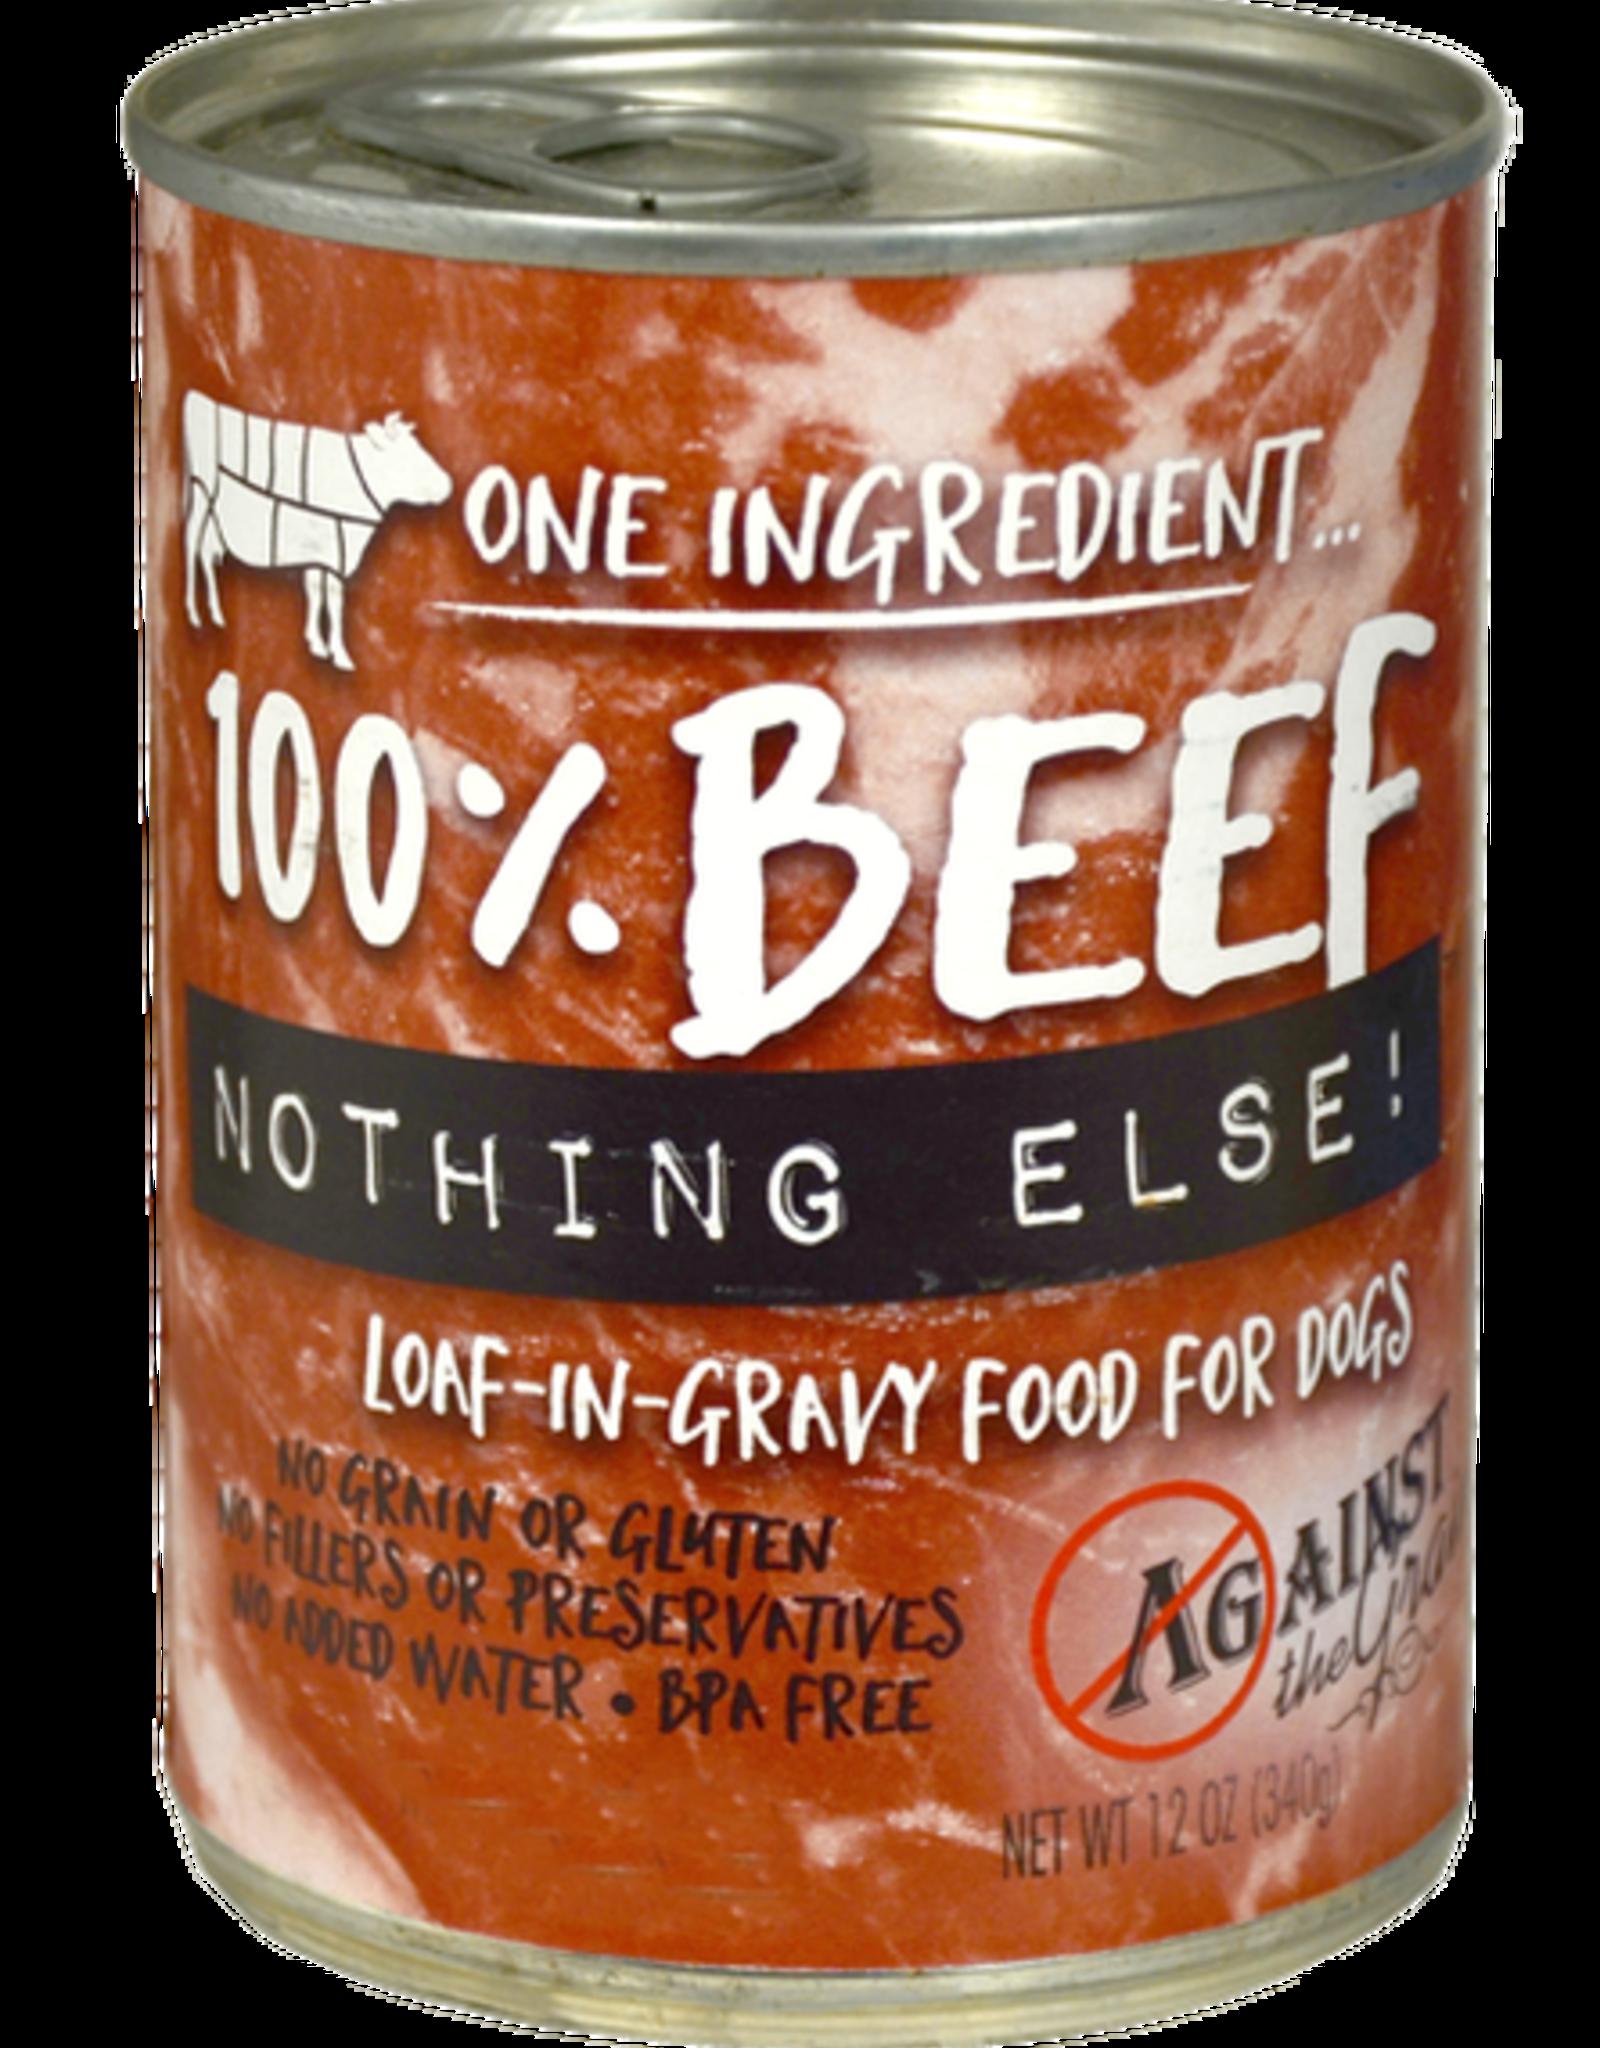 Against The Grain Against The Grain Nothing Else 100% Beef